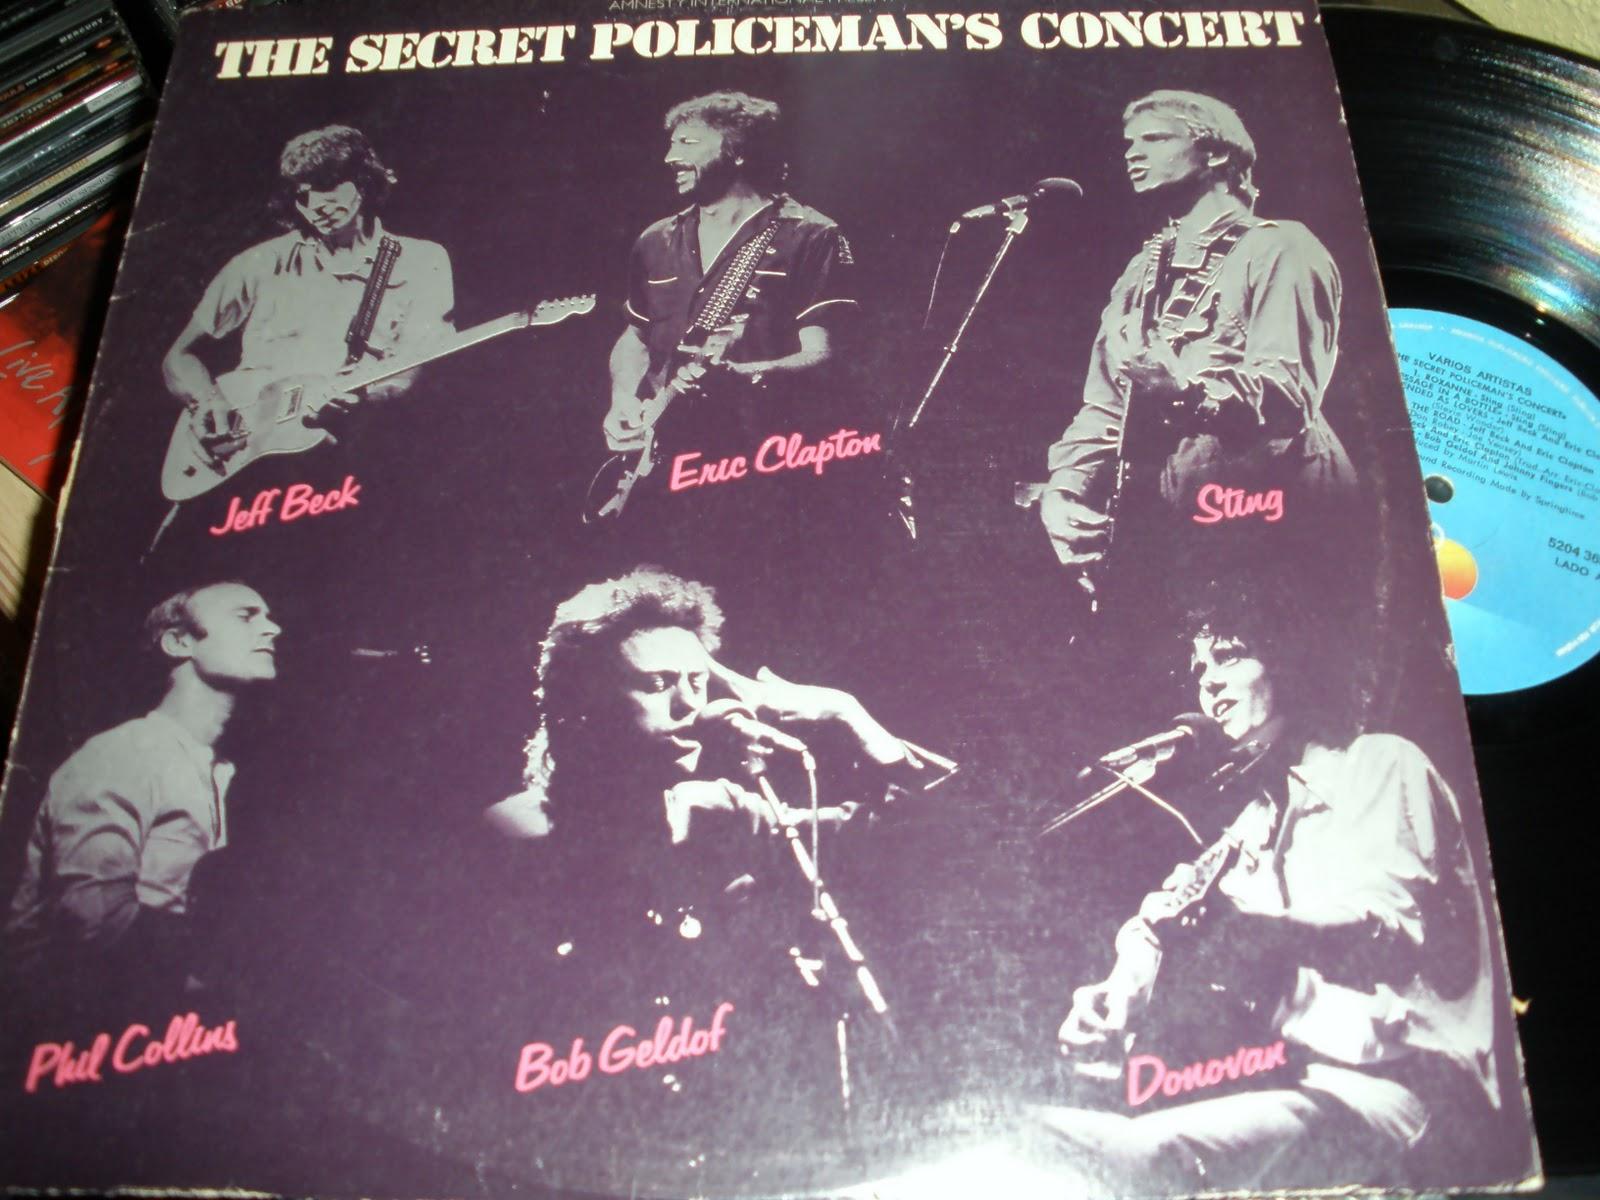 http://1.bp.blogspot.com/-8CUUjP_t0Vs/Tr1lh-PG5zI/AAAAAAAACDo/AbhImzwRtD8/s1600/the+secret+policeman%2527s+concert.JPG